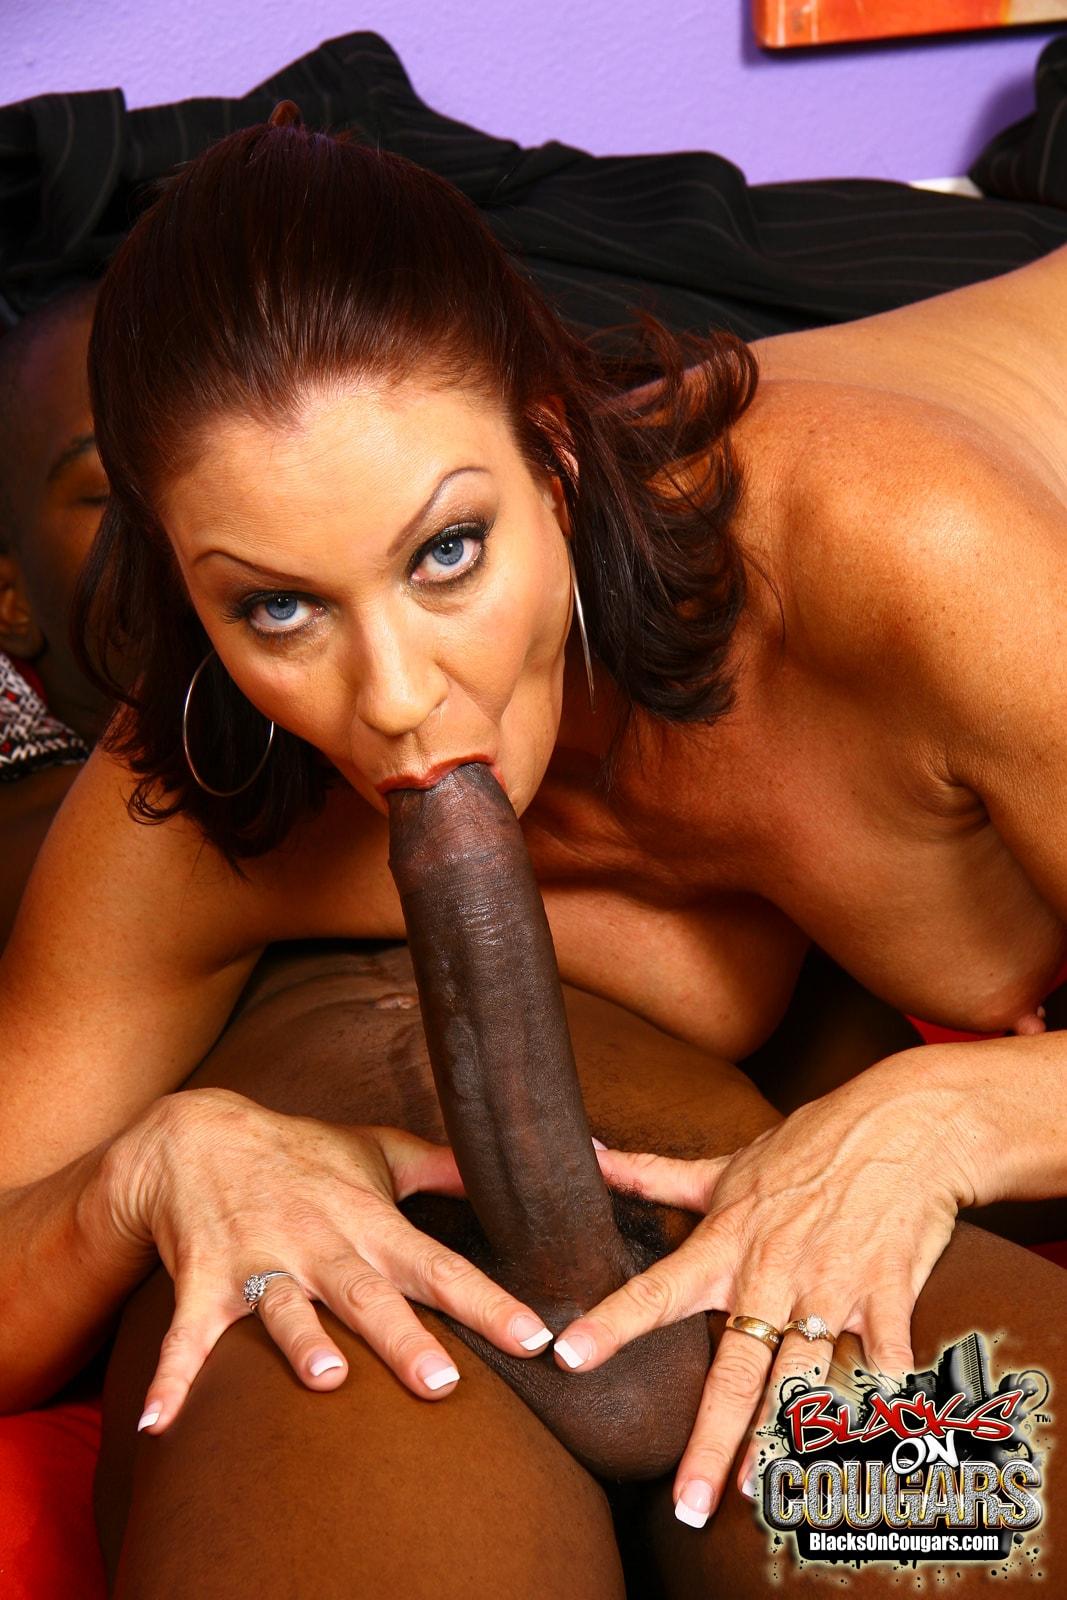 Dogfart '- Blacks On Cougars' starring Vanessa Videl (Photo 14)